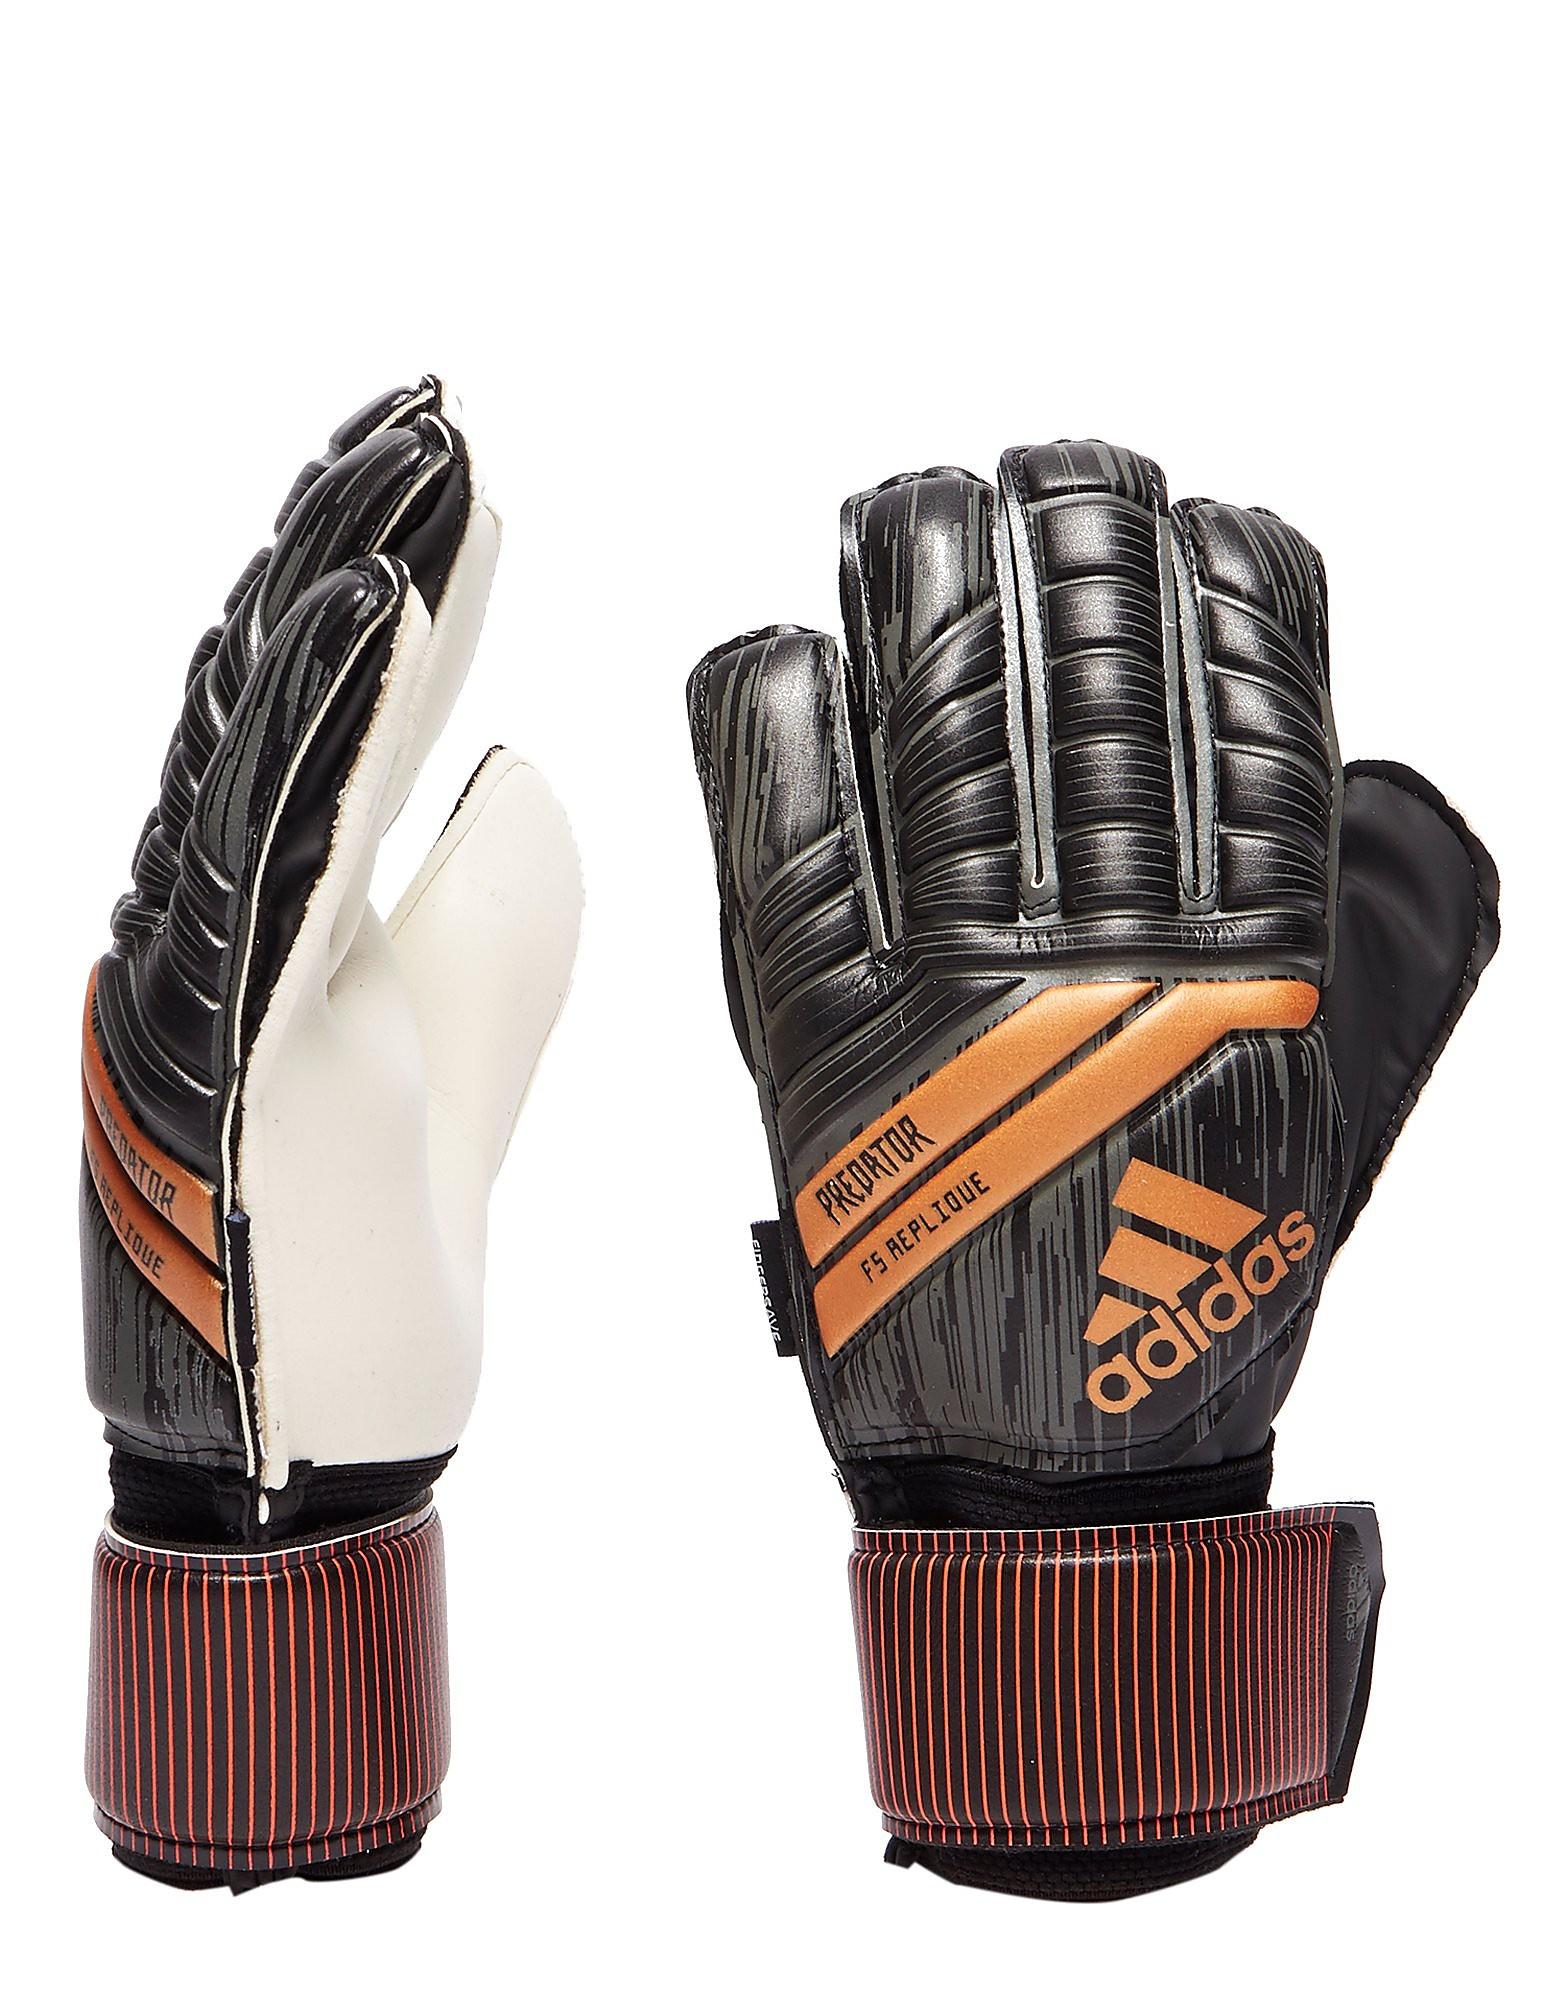 adidas Predator 18 Fingersave Replique Gloves